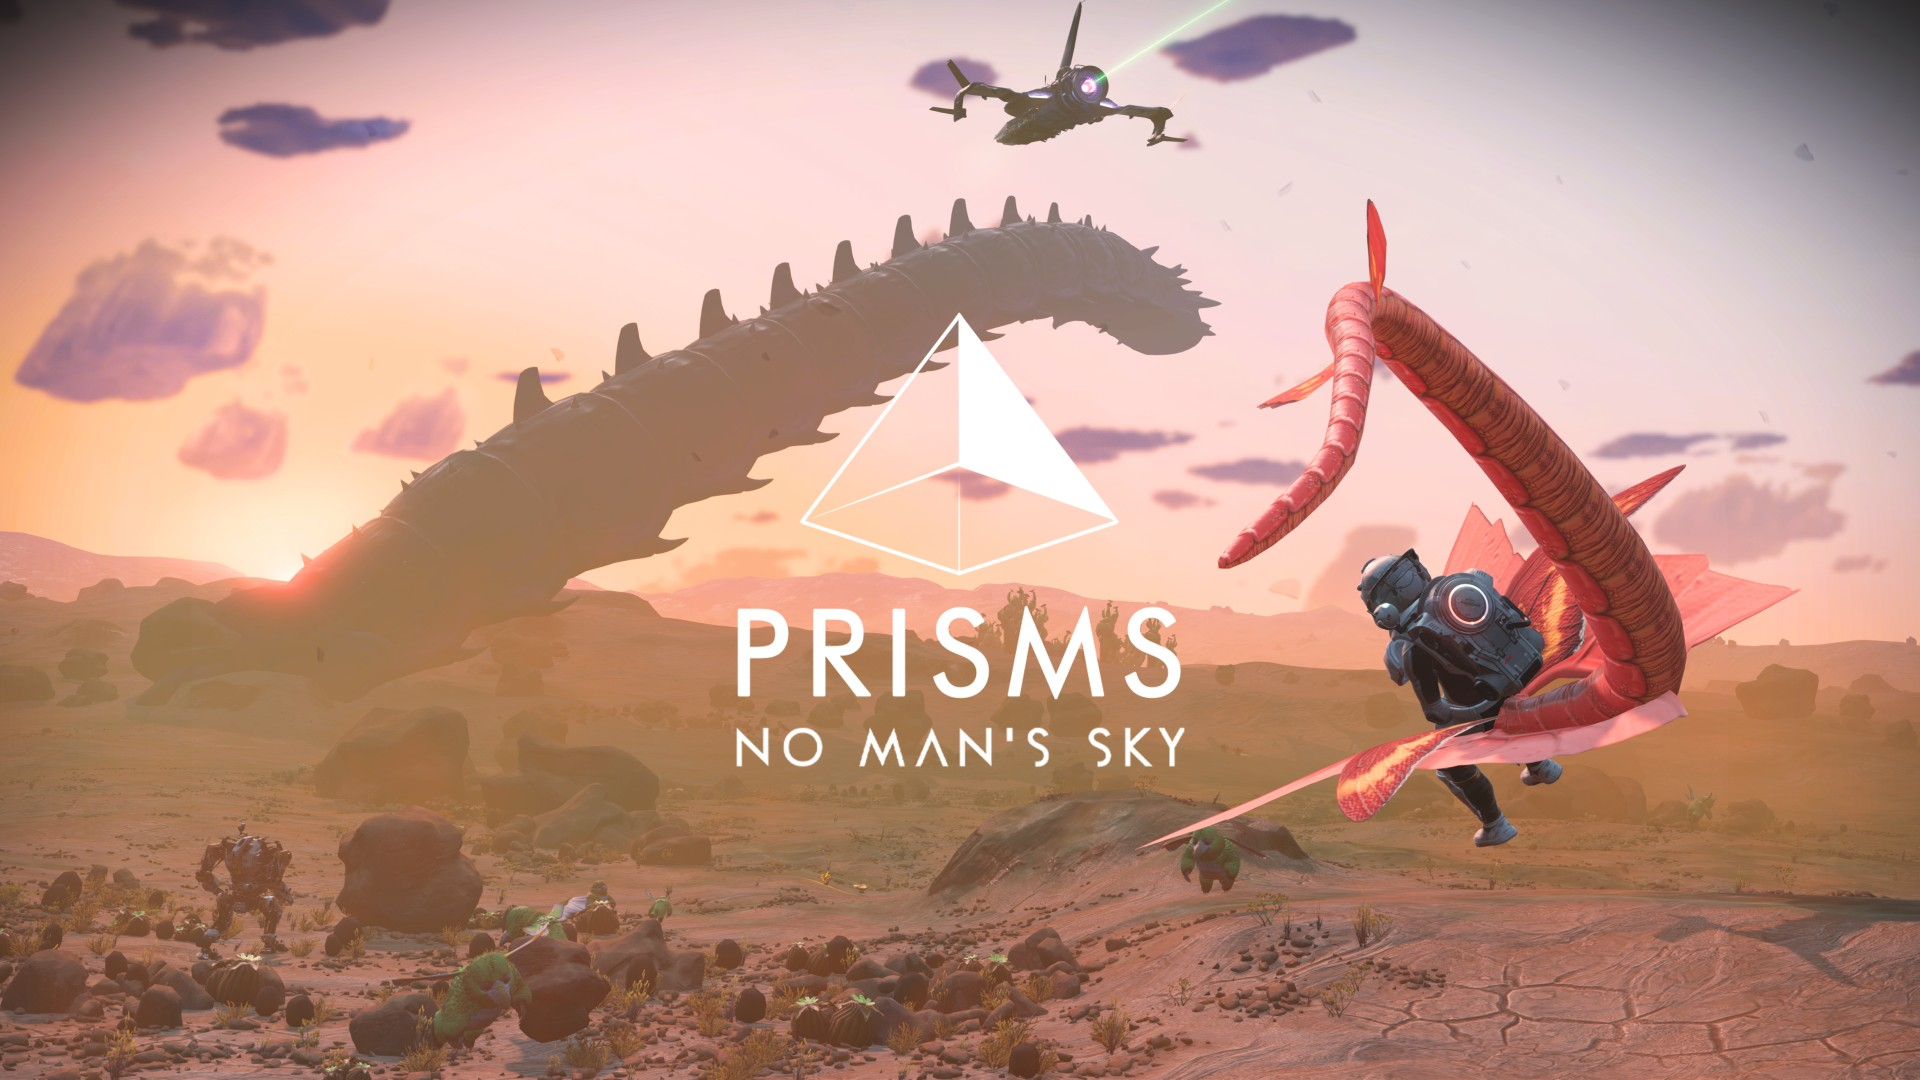 No Mans Sky Prisms Thumbnail_JPG